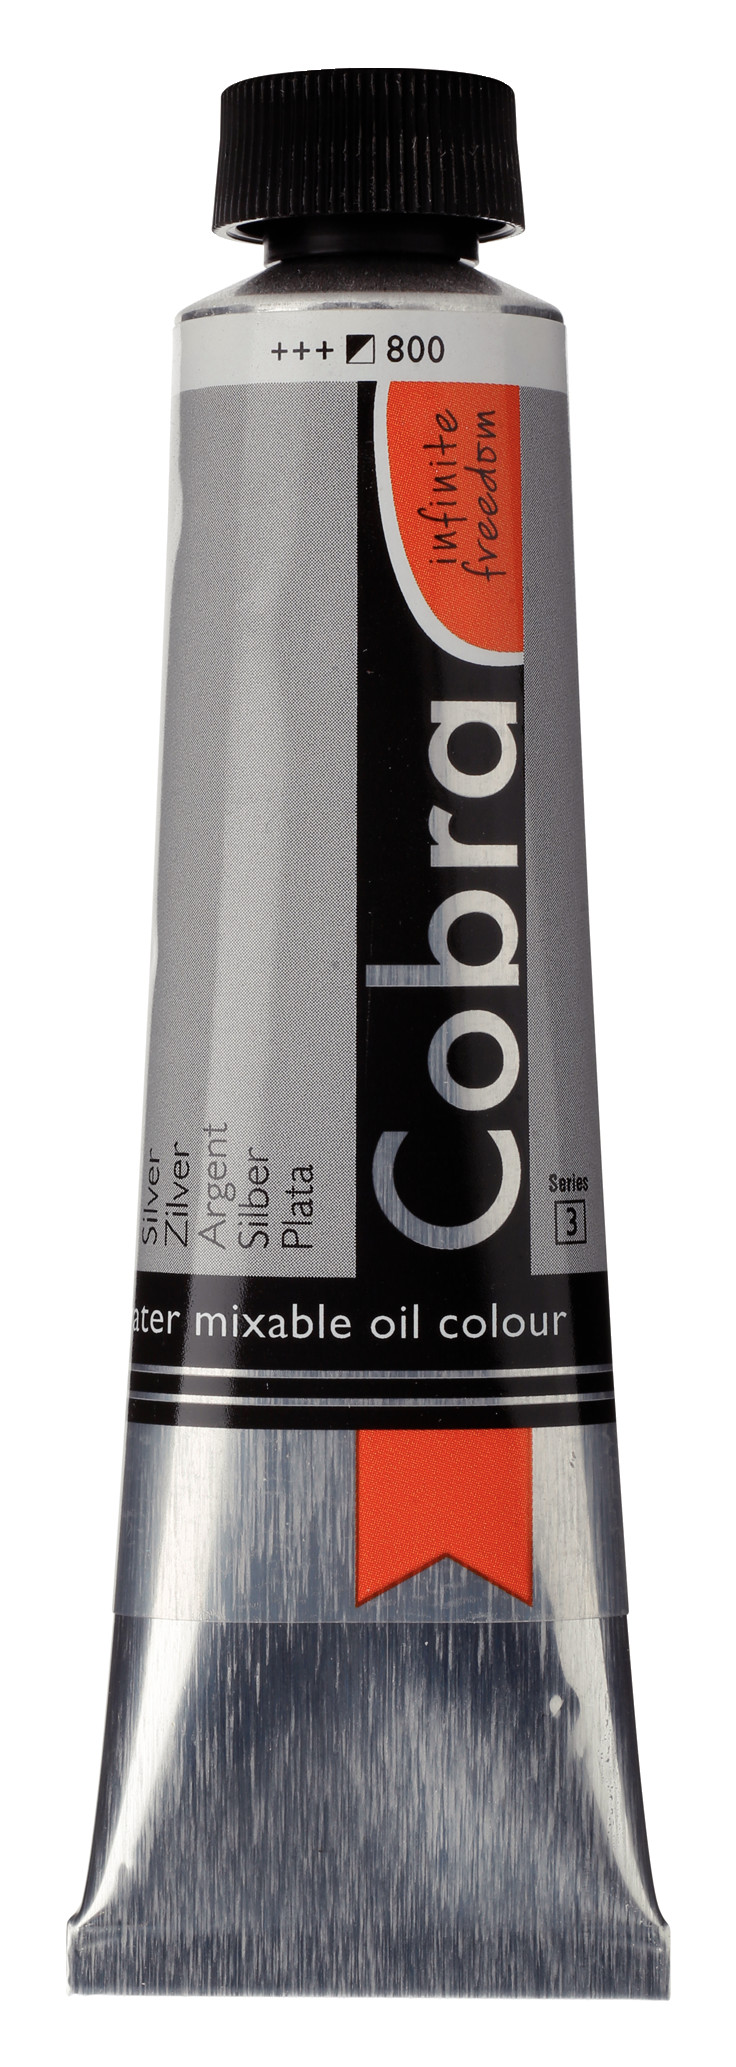 Cobra Artist Water Mixable Oil Colour Tube 40 ml Silver 800